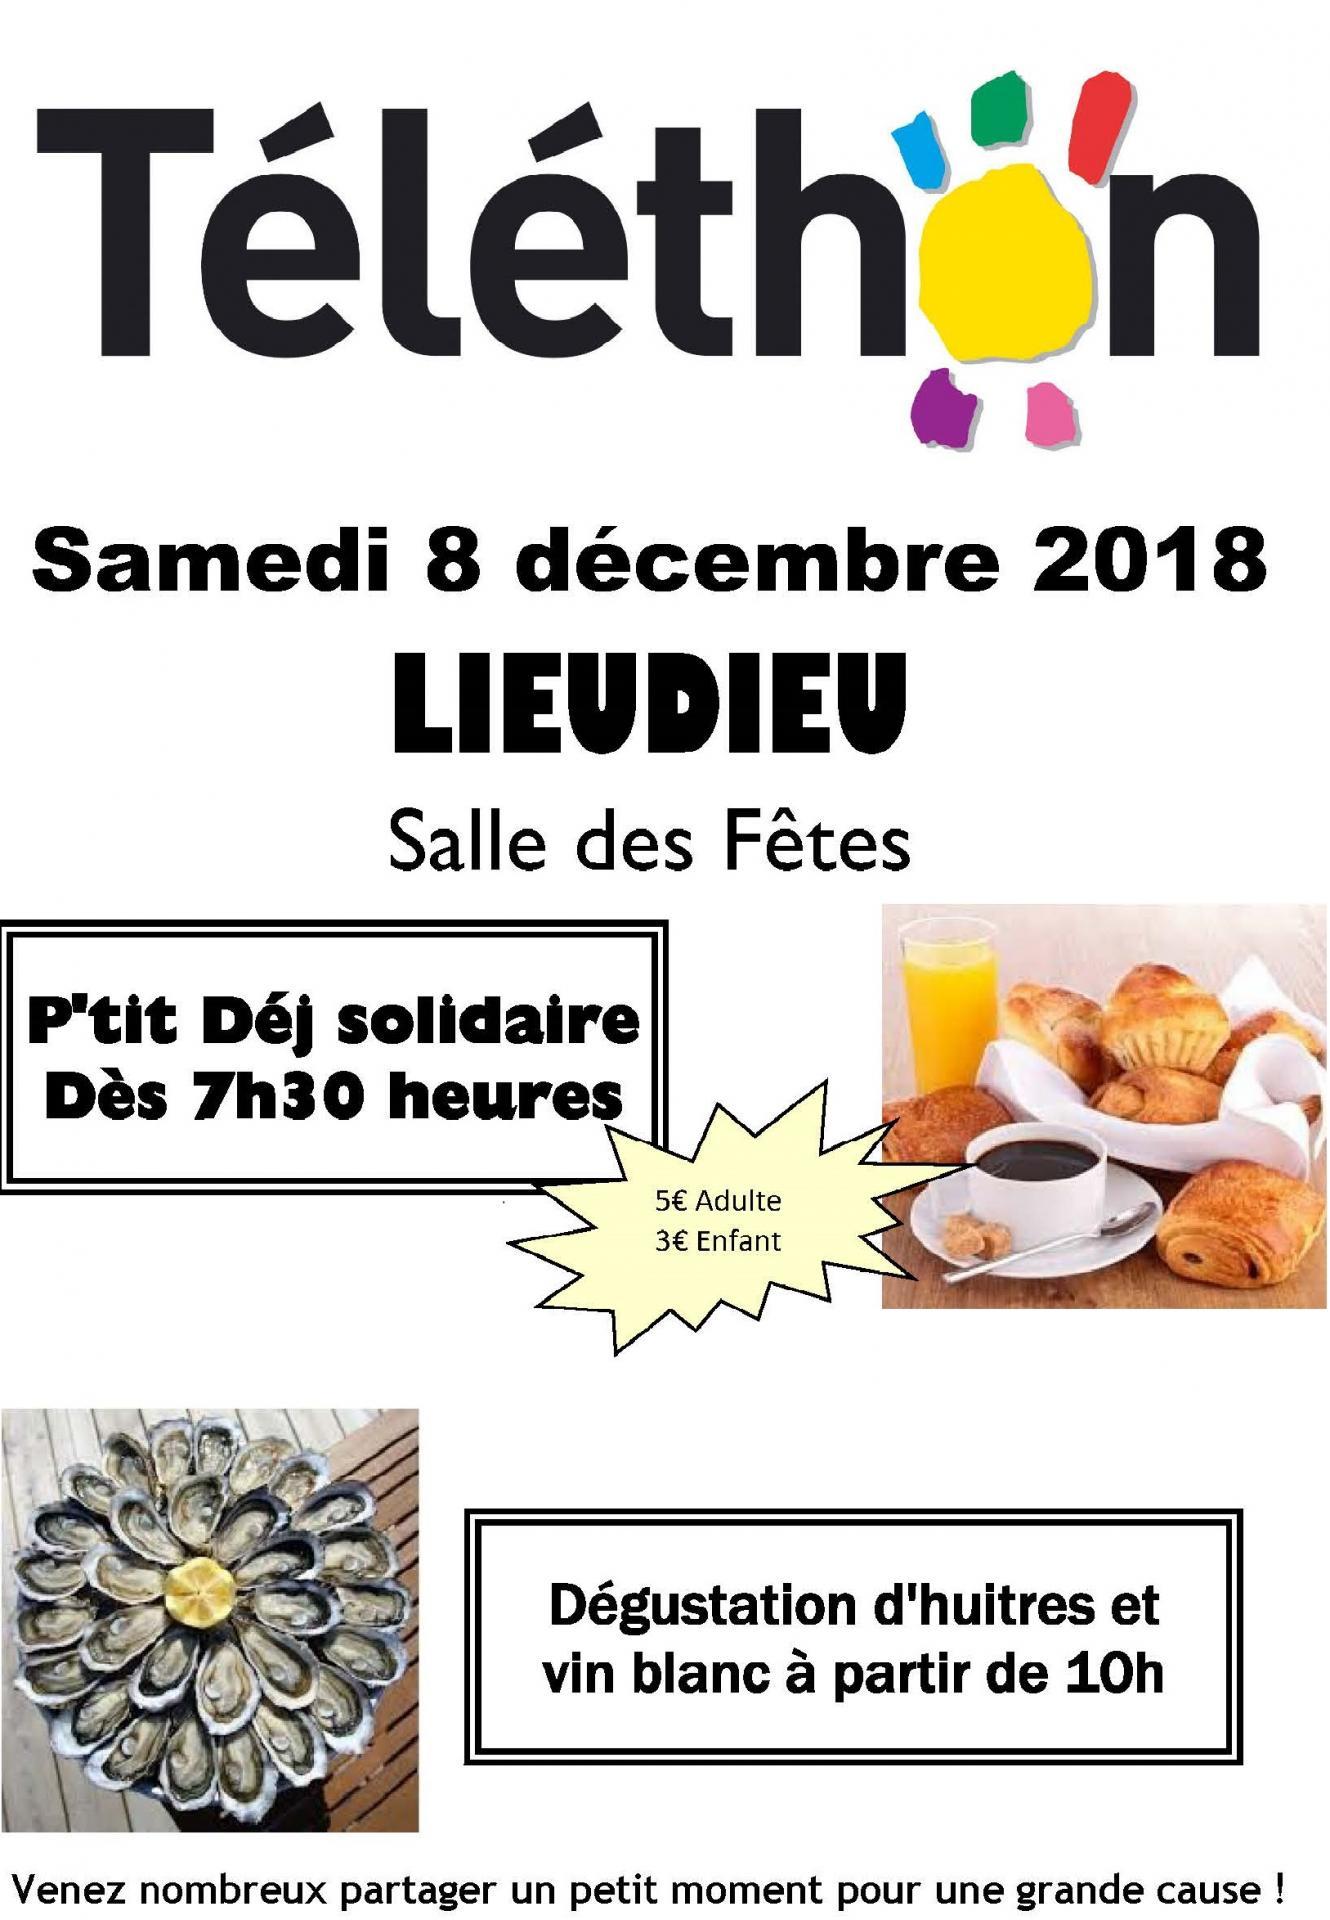 Affiche telethon 2018